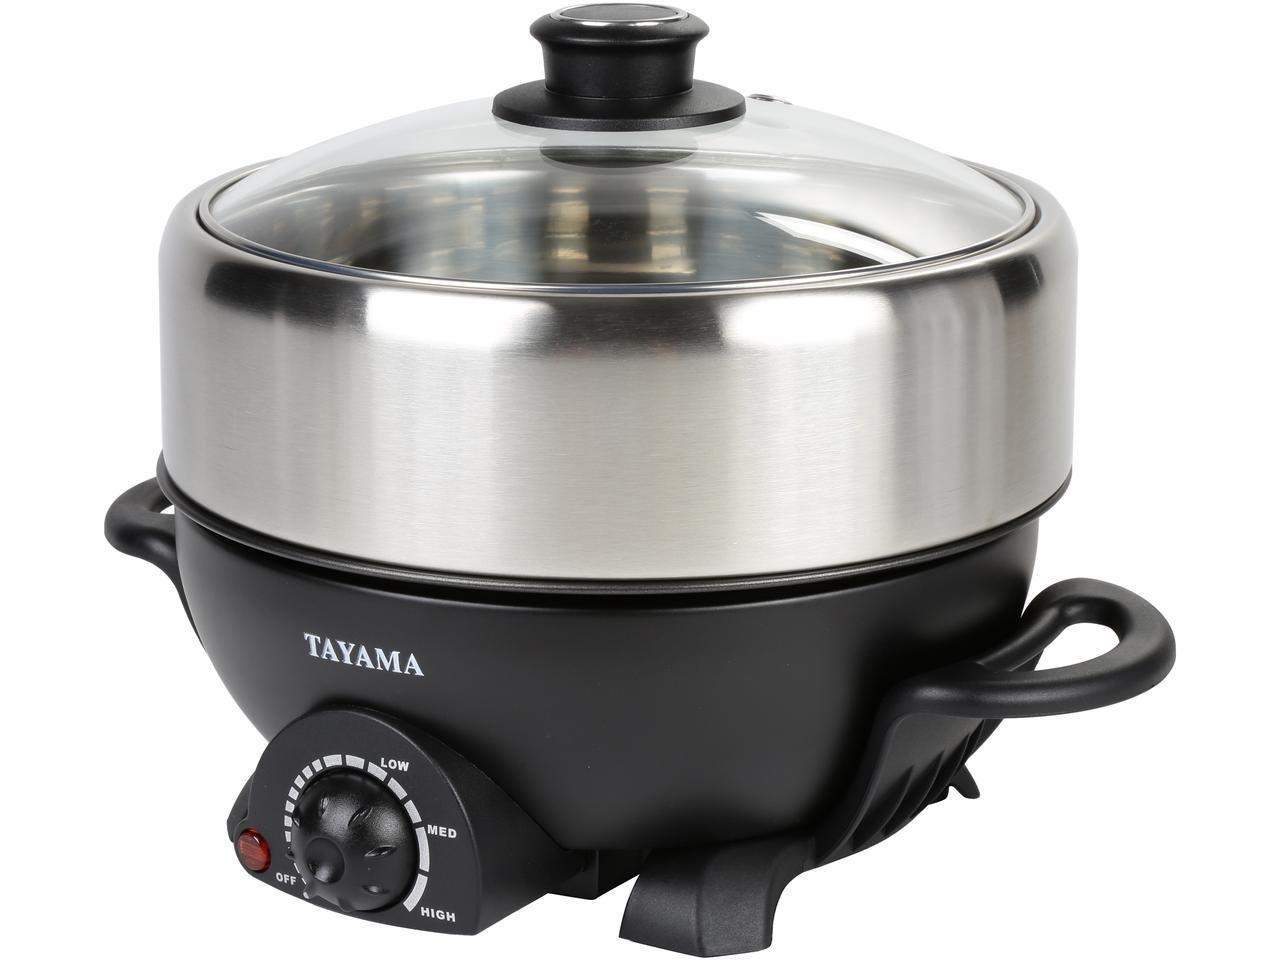 TRMC-40 Shabu and Grill Multi-Cooker, 4 quart, Black Tayama